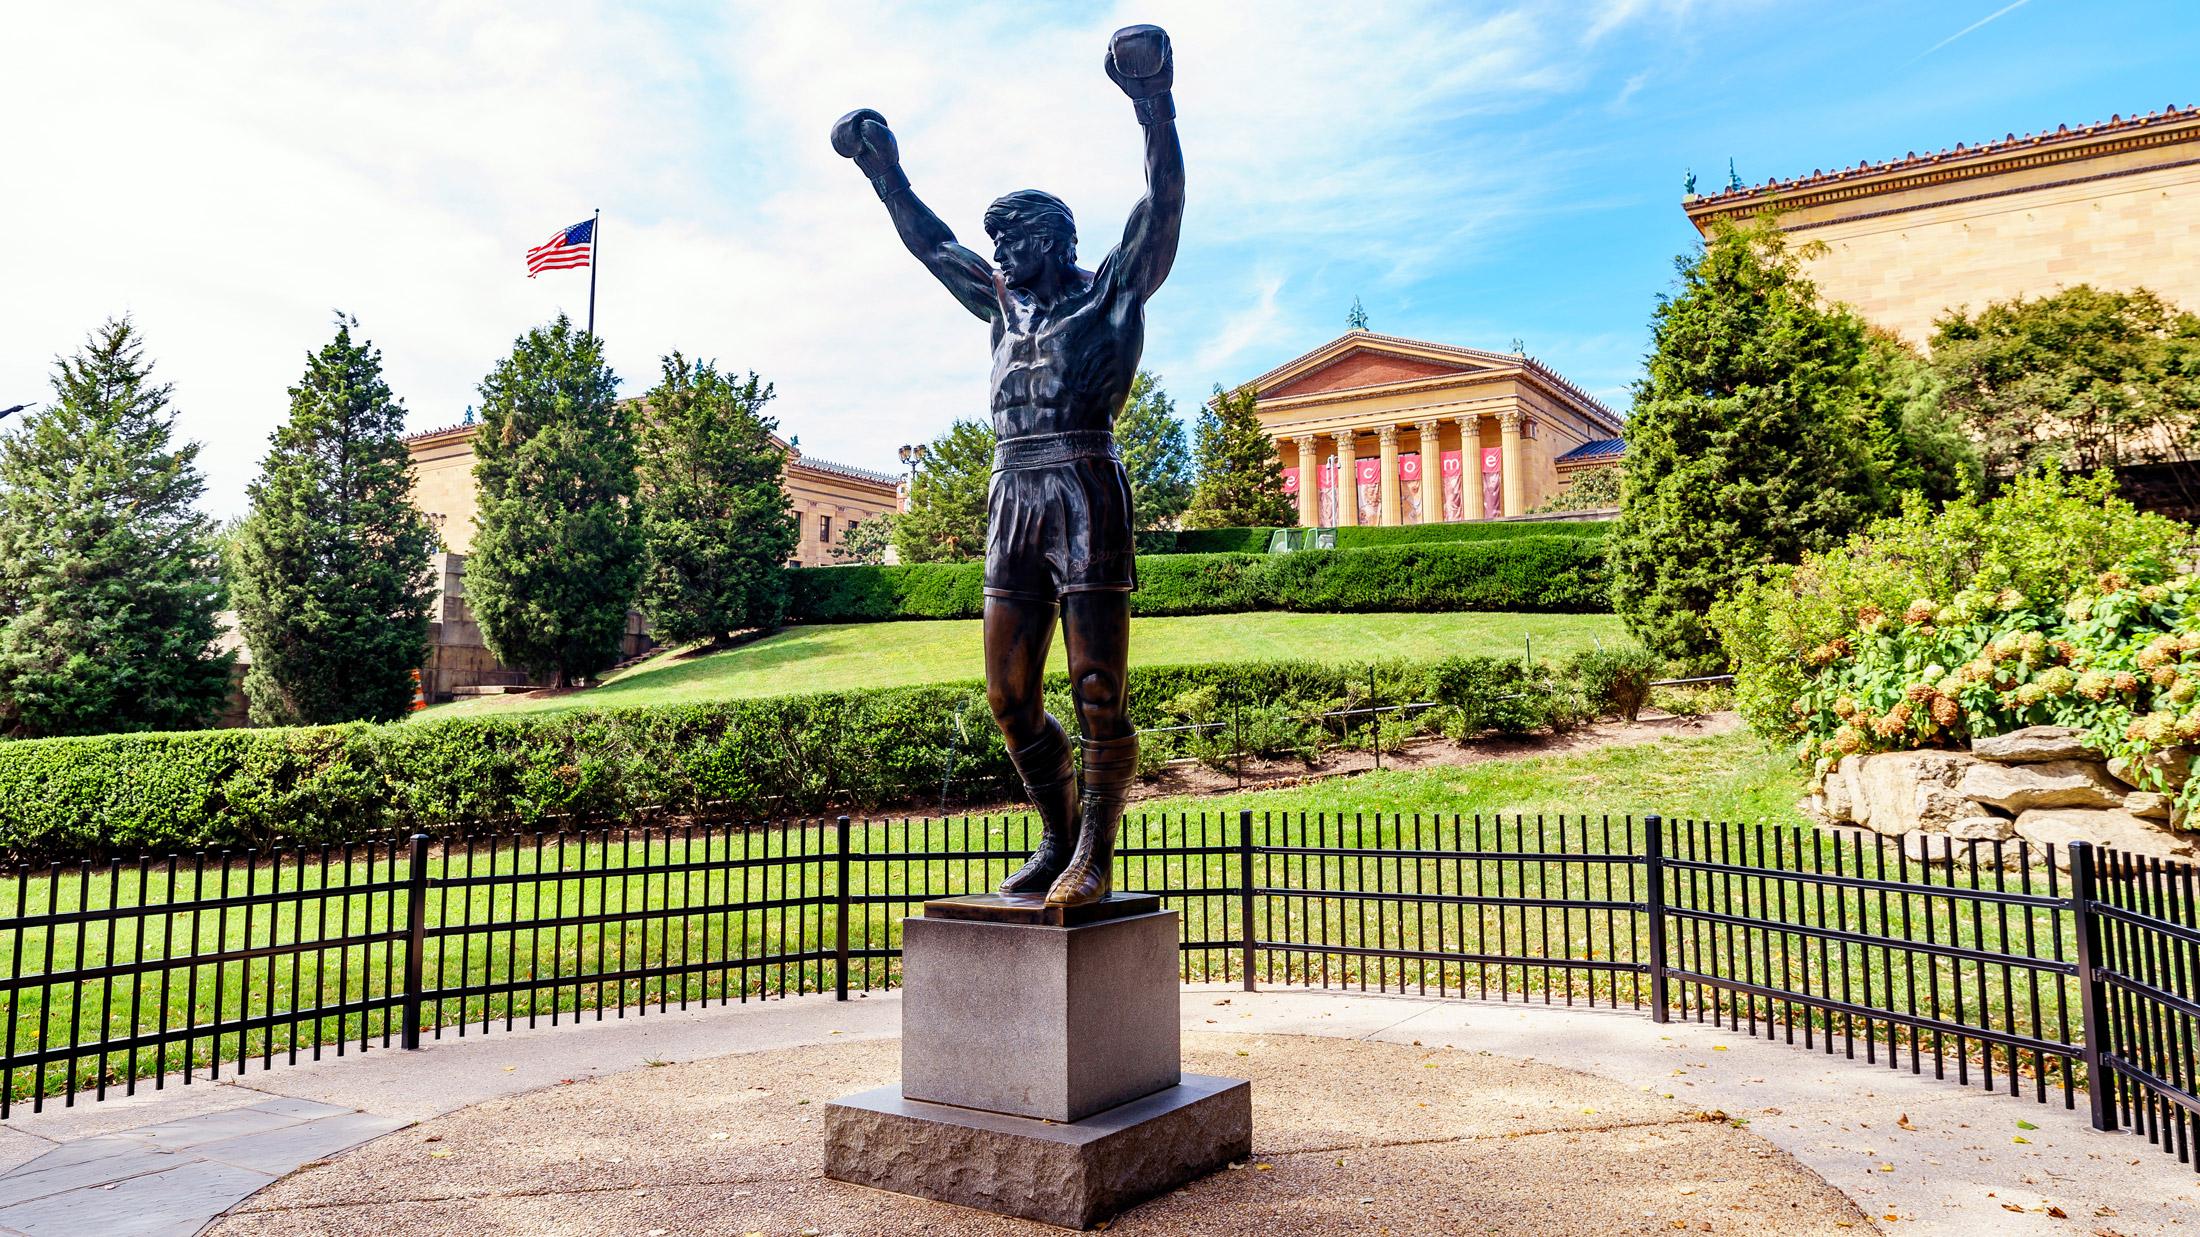 Rocky and Creed Tour of Philadelphia - Visit Philadelphia